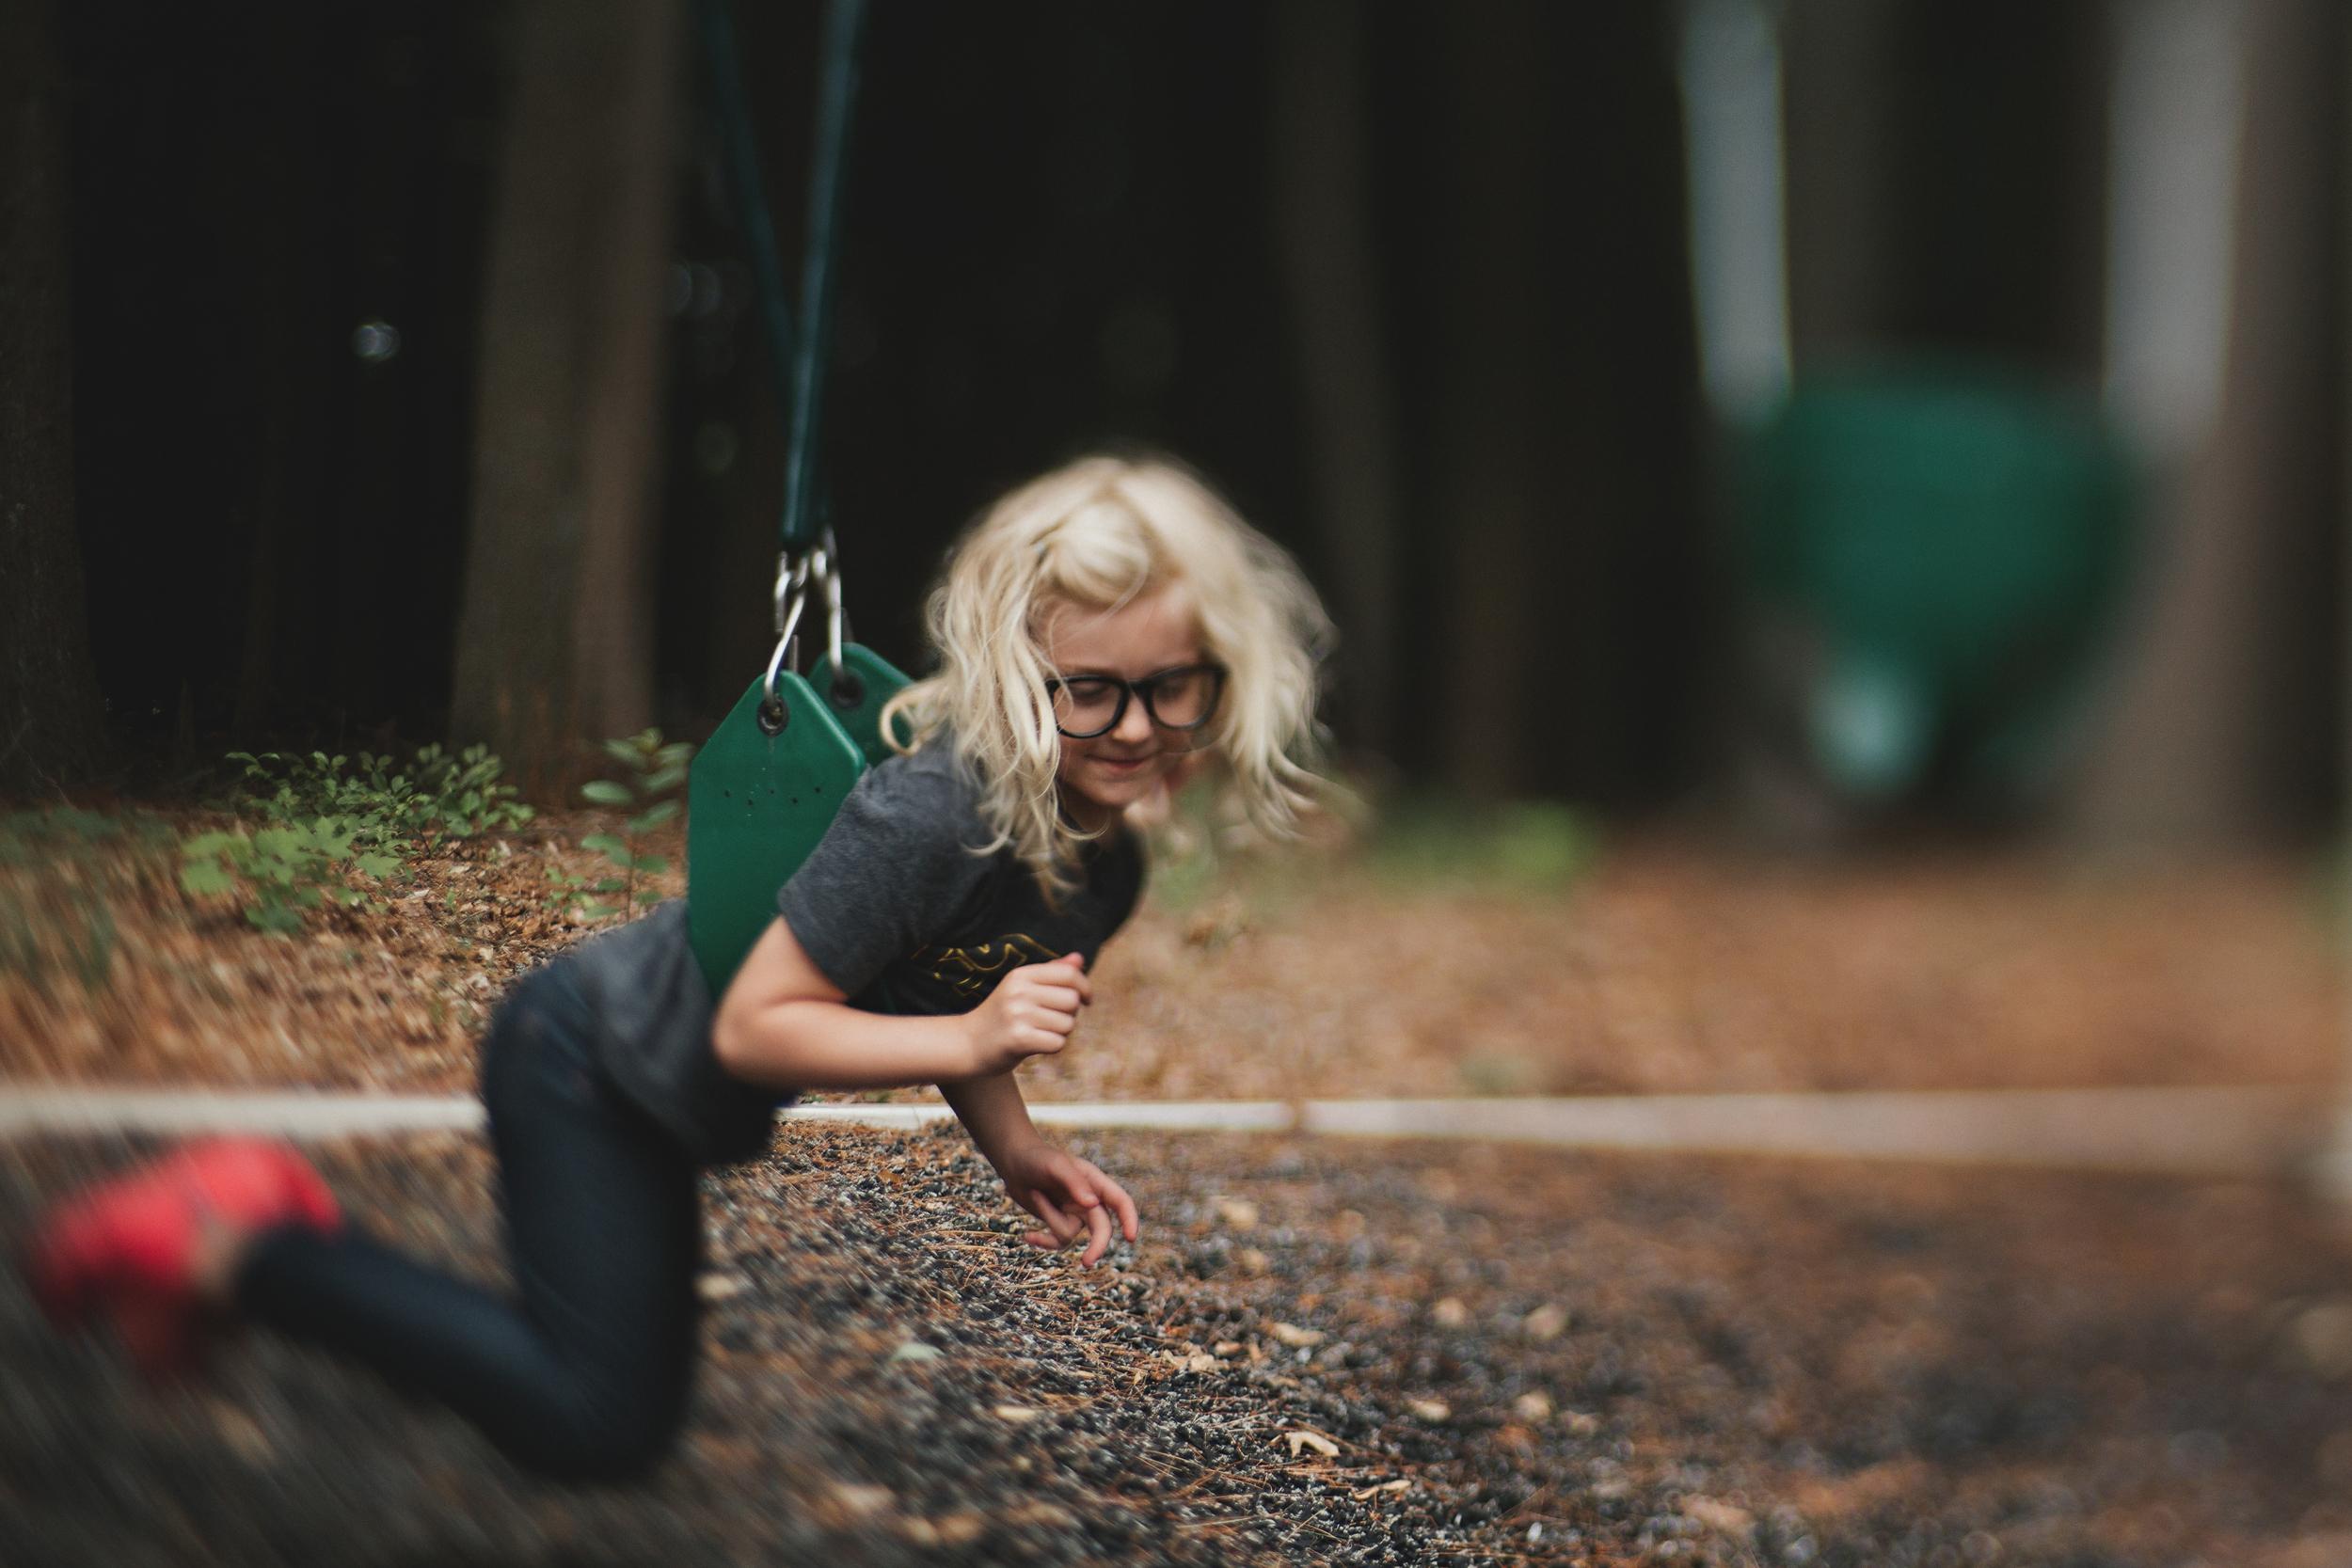 Hello-olivia-photography-long-lsland-family-children-documentary-photographer-childrens-freelensing-edge-80-lensbaby